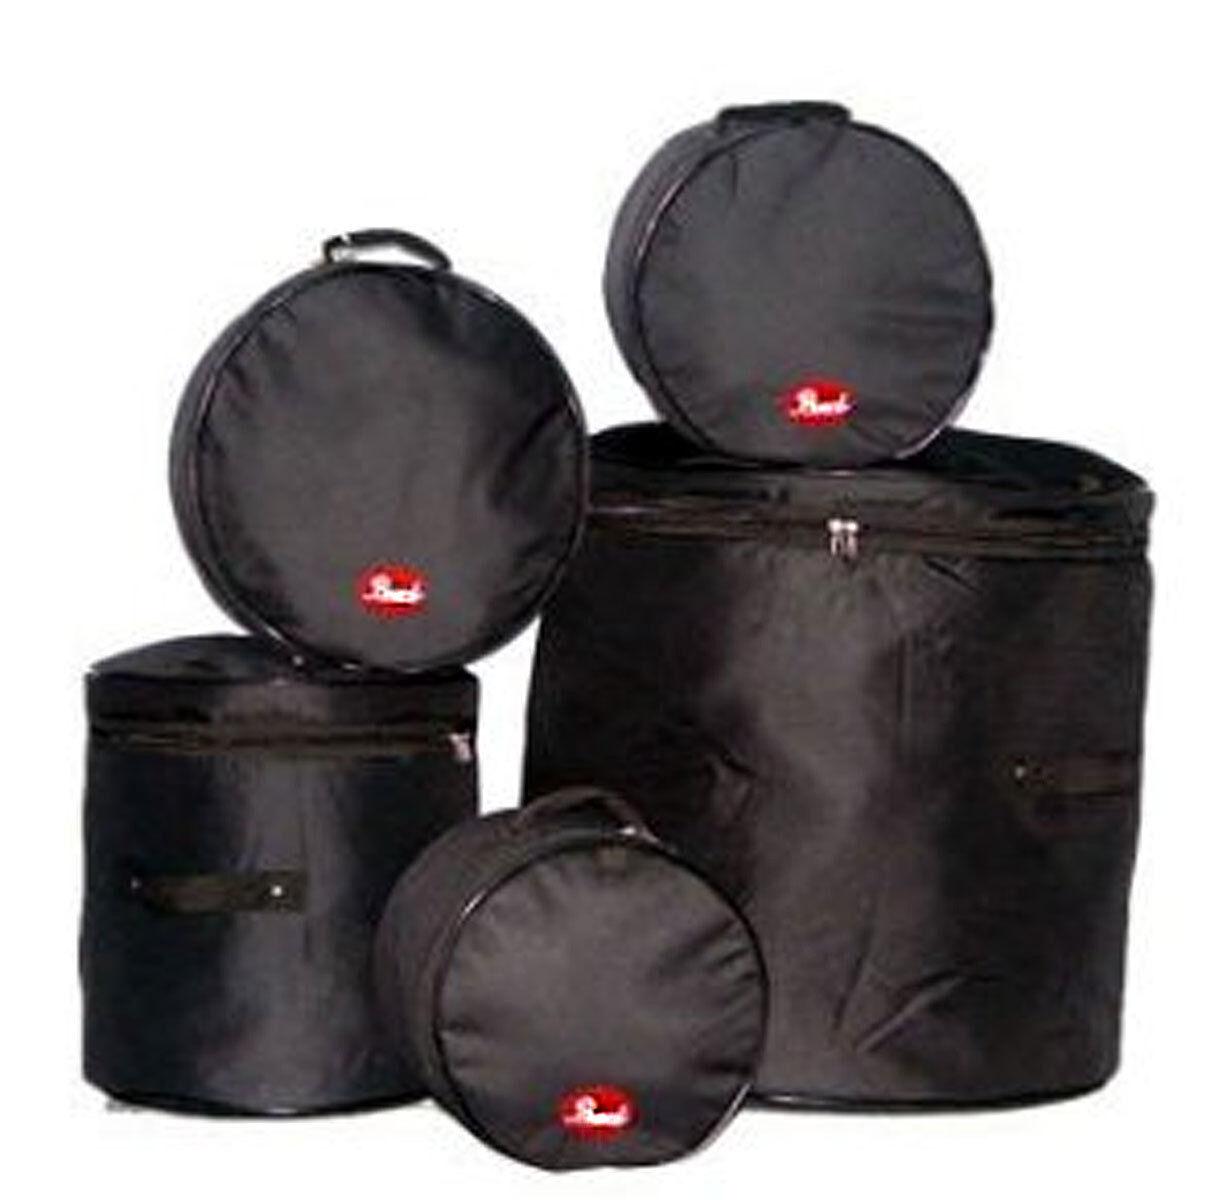 PEARL DBS02N Bag Drumbag 20  BD Schlagzeug Taschenset